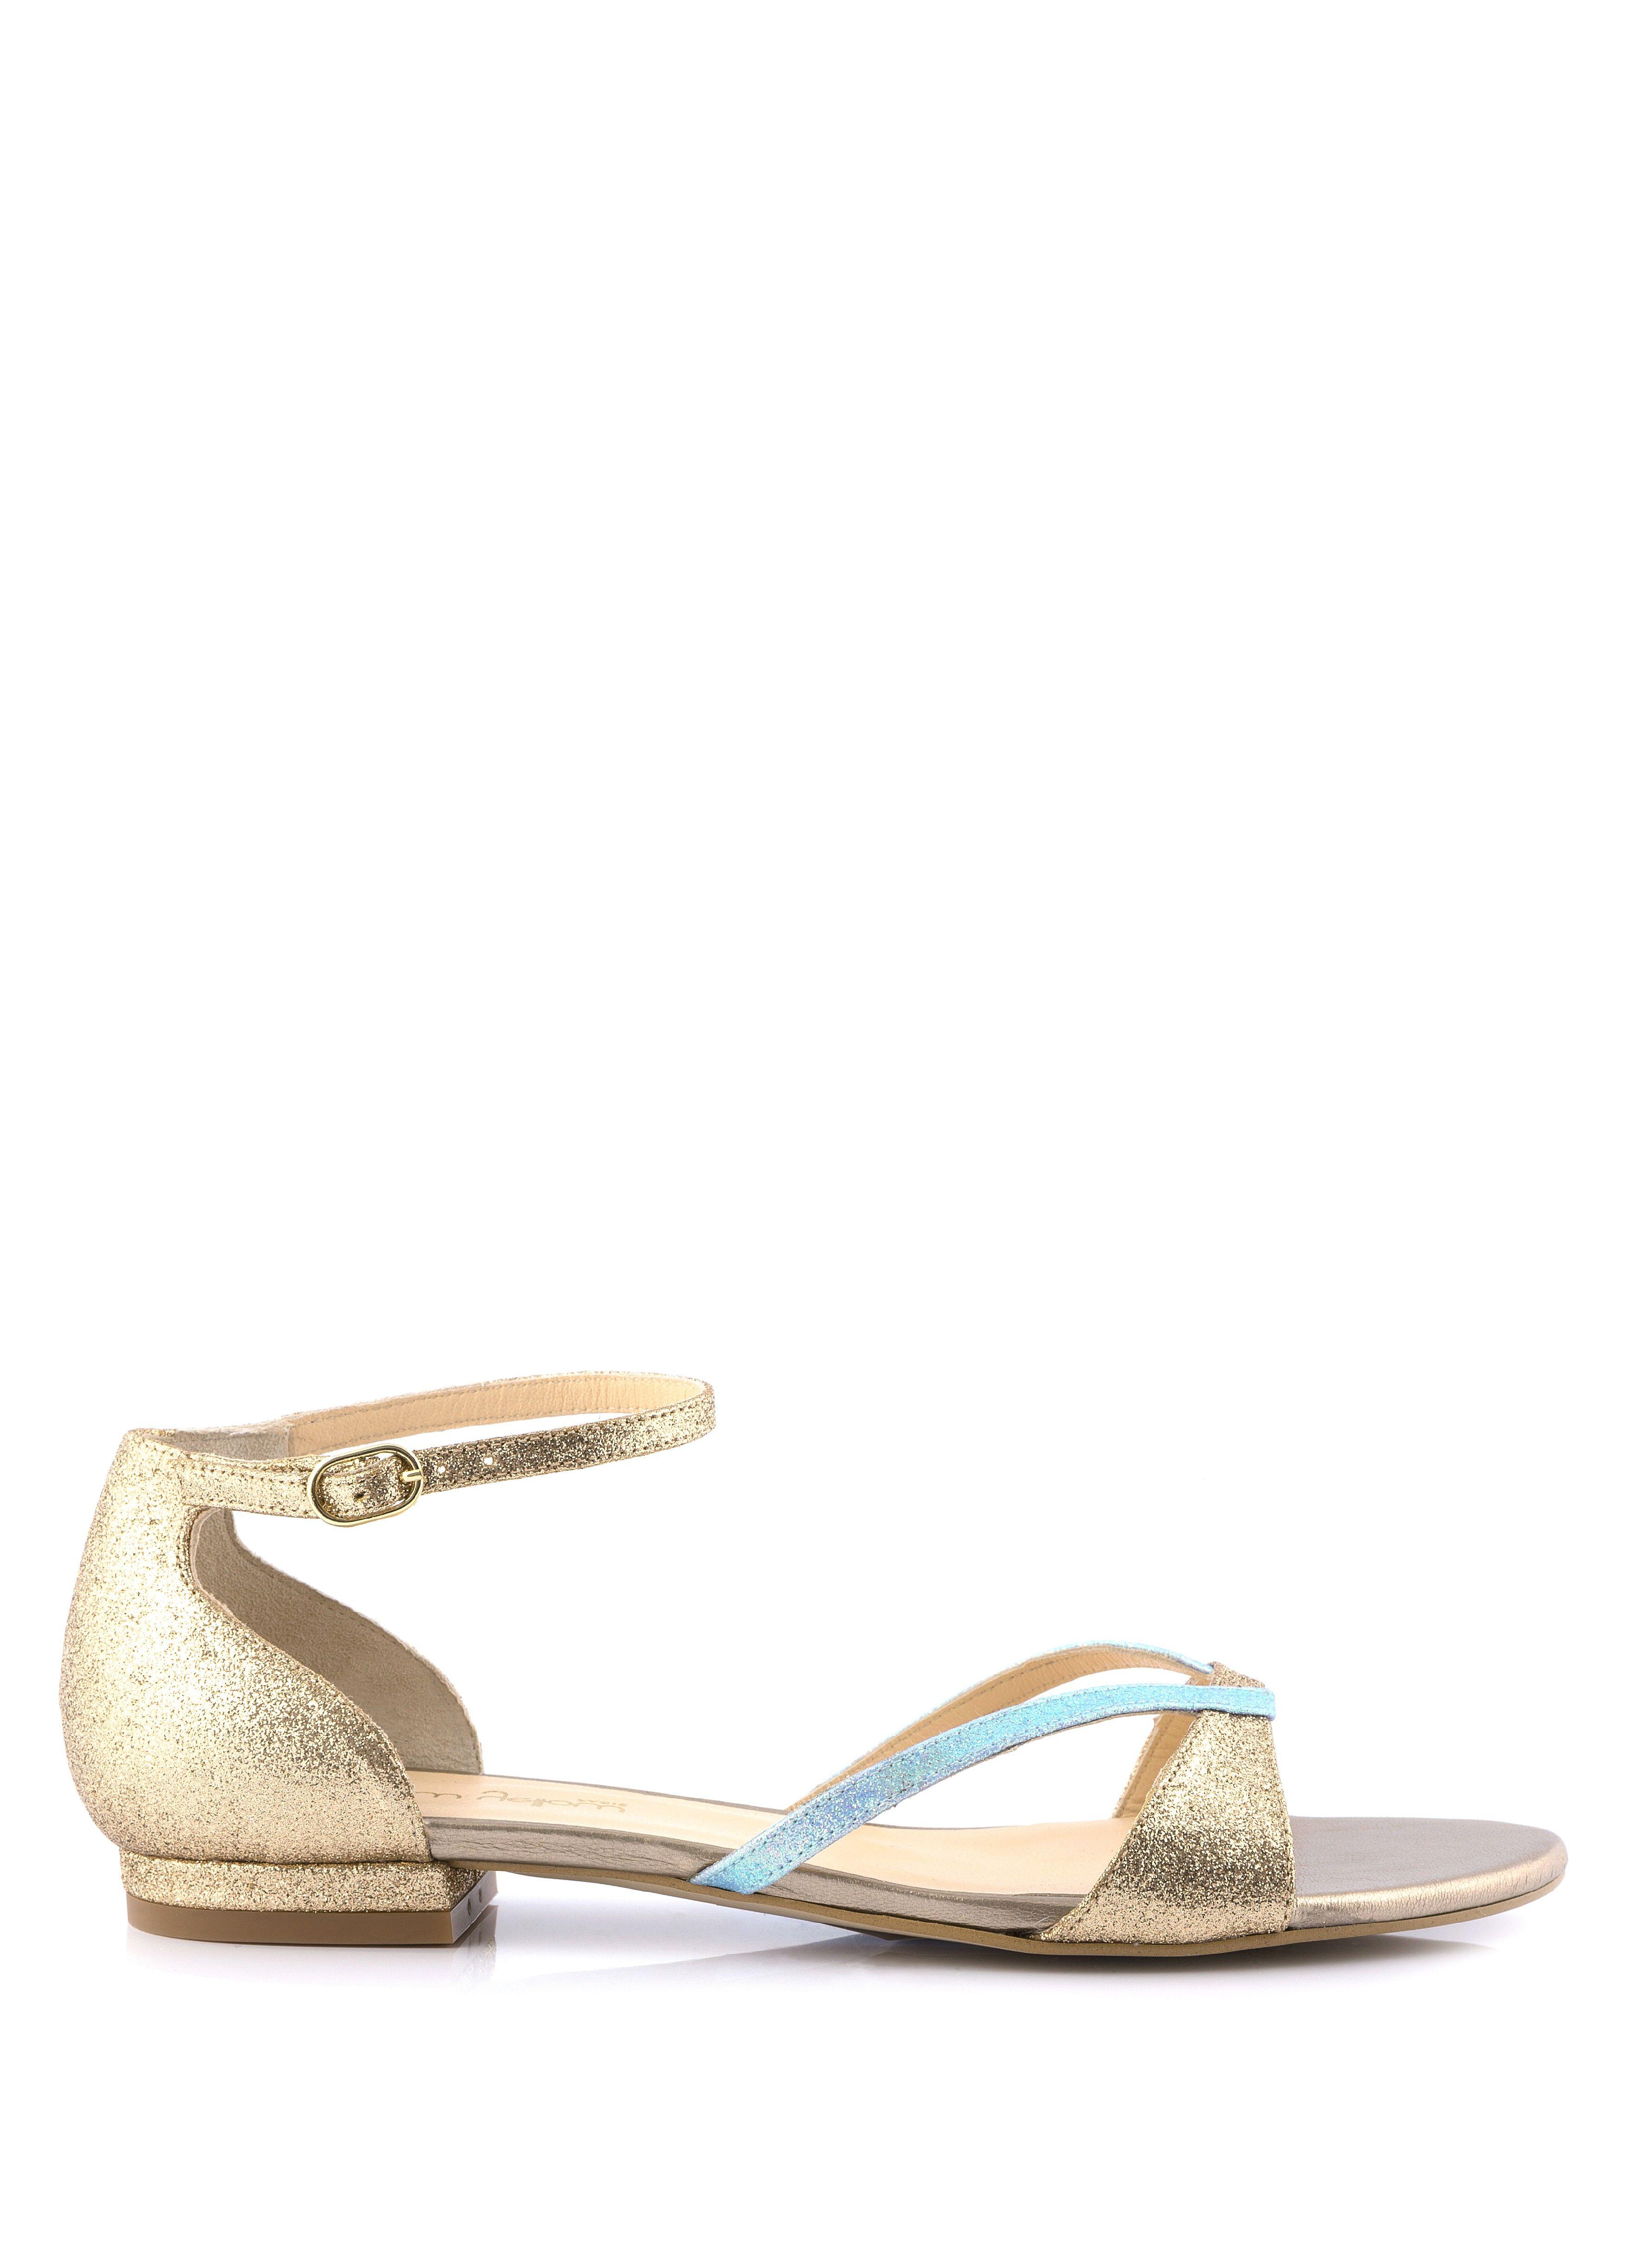 sandale plate sedante bleu clair - sandales plates - femme